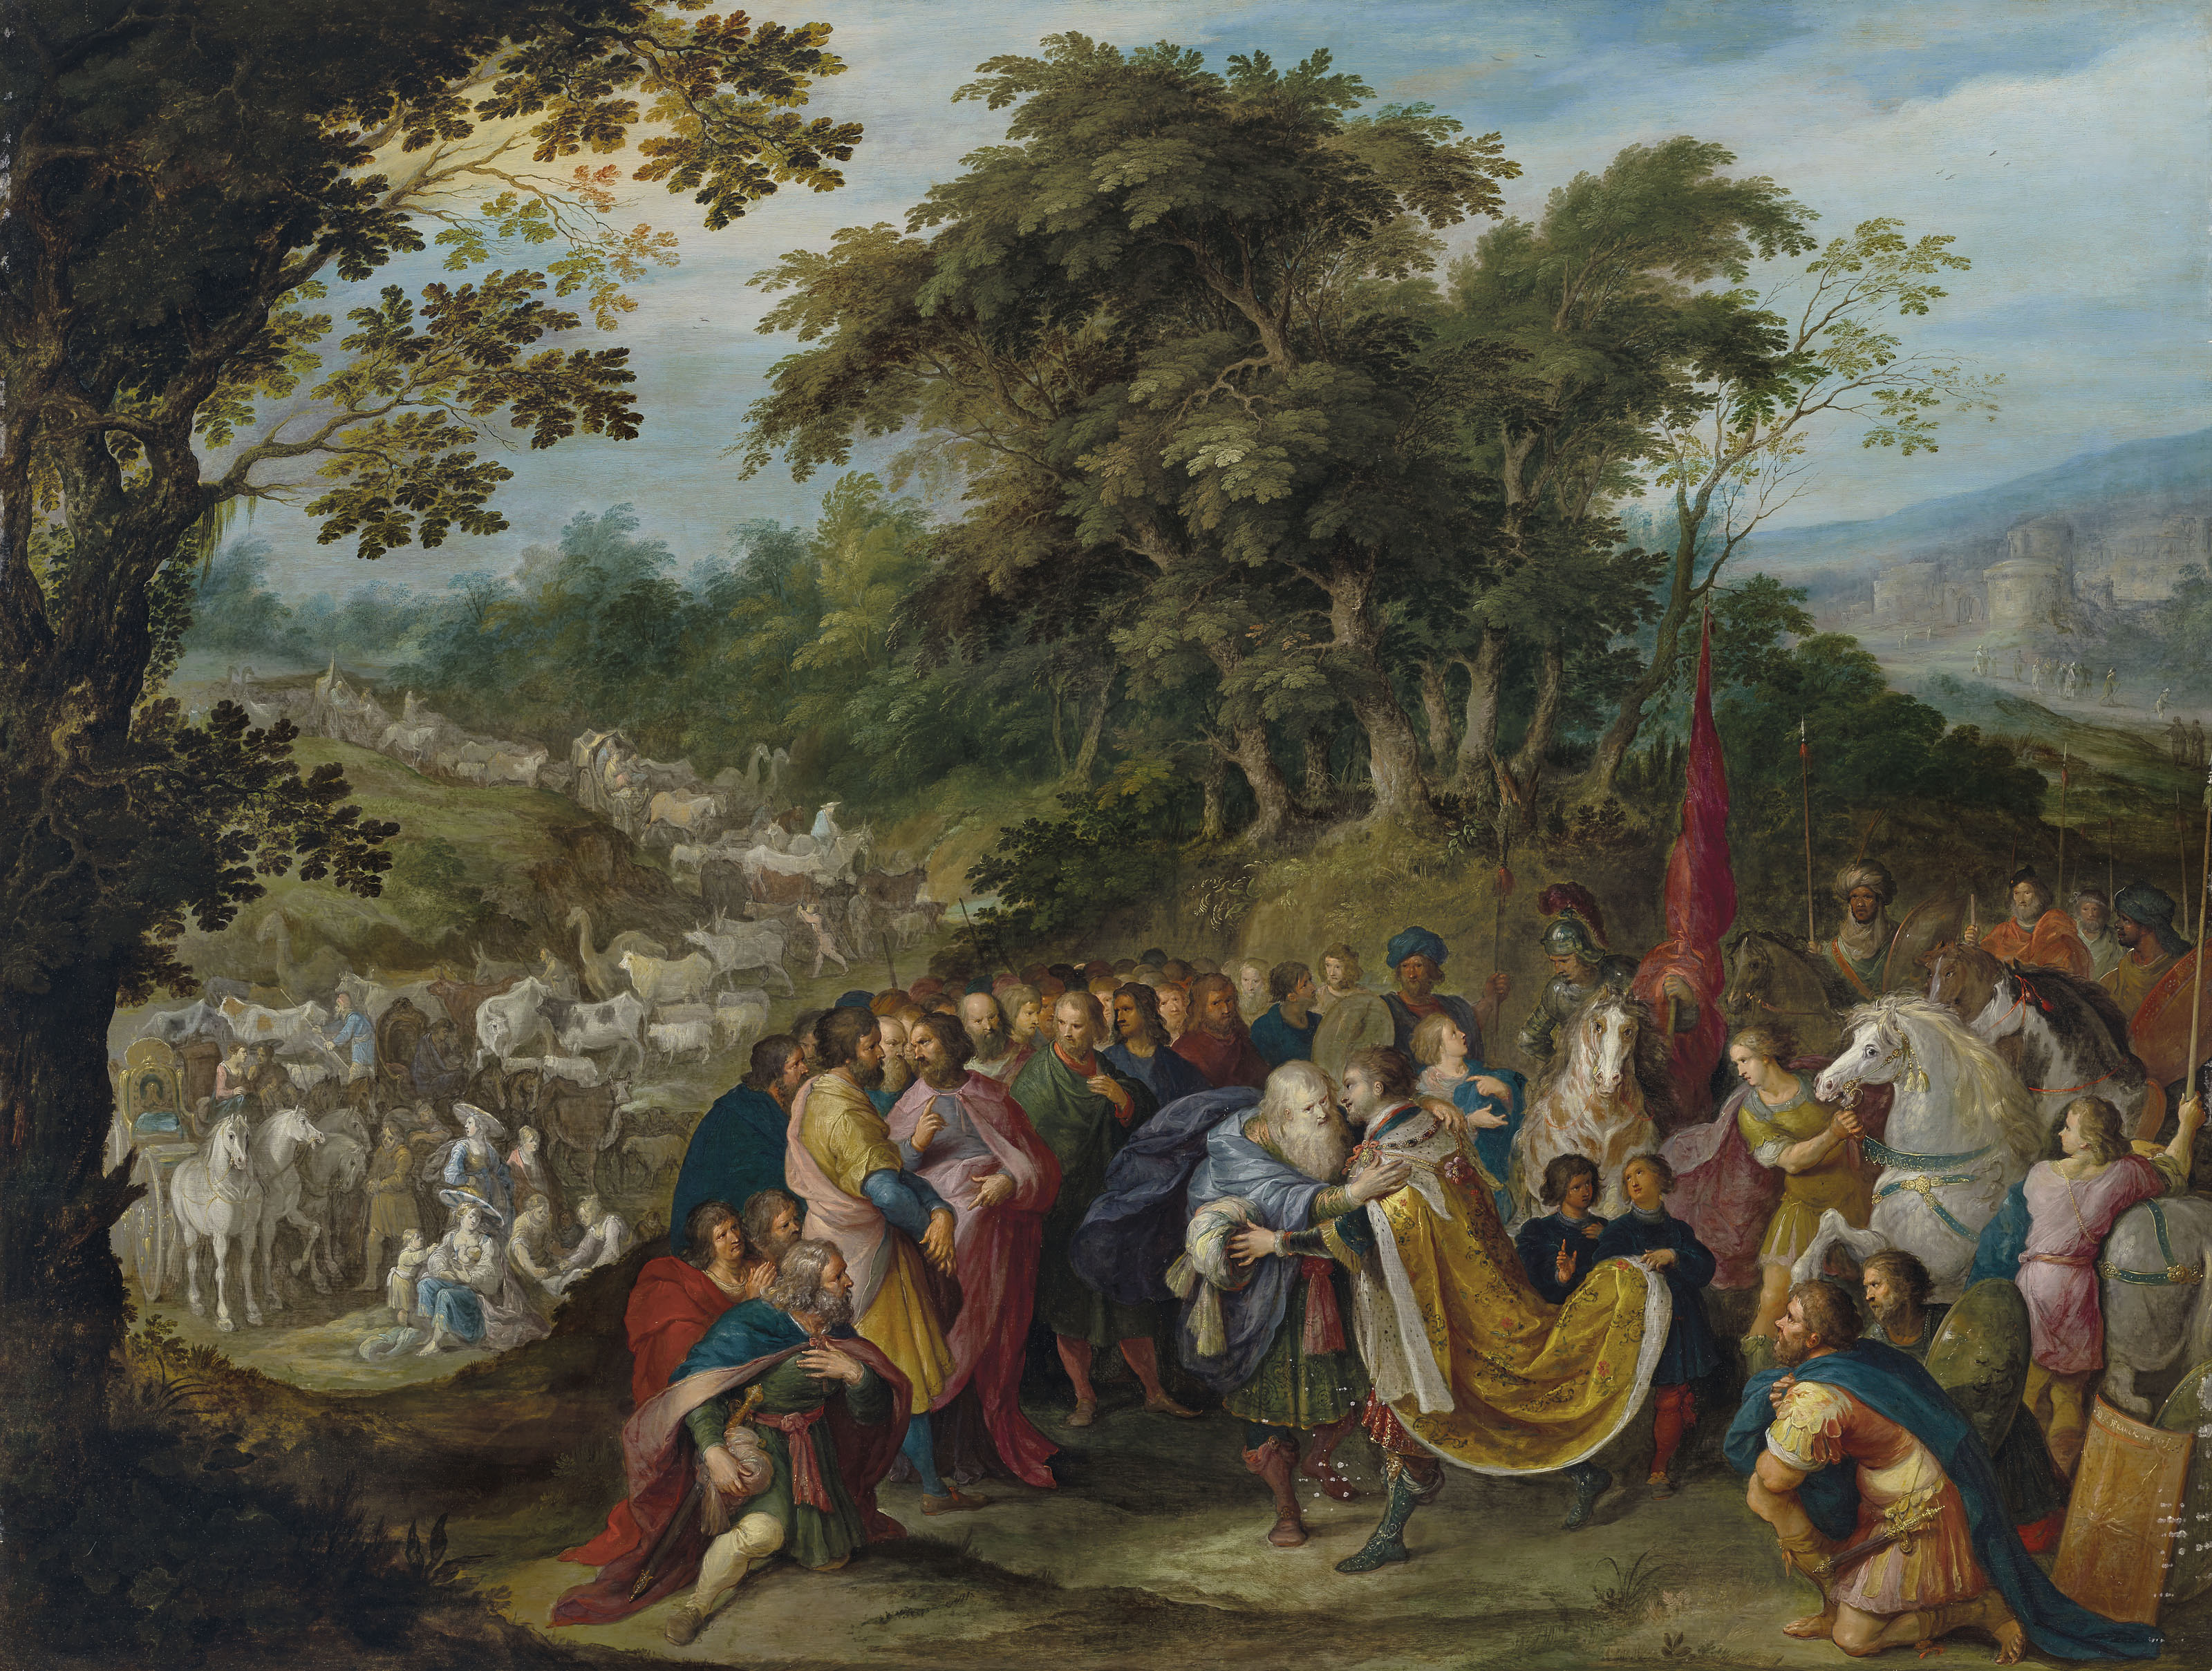 Frans Francken II (Antwerp 1581-1642), Abraham Govaerts (Antwerp 1589-1626) and Hans Jordaens III (Antwerp c. 1595-1643)